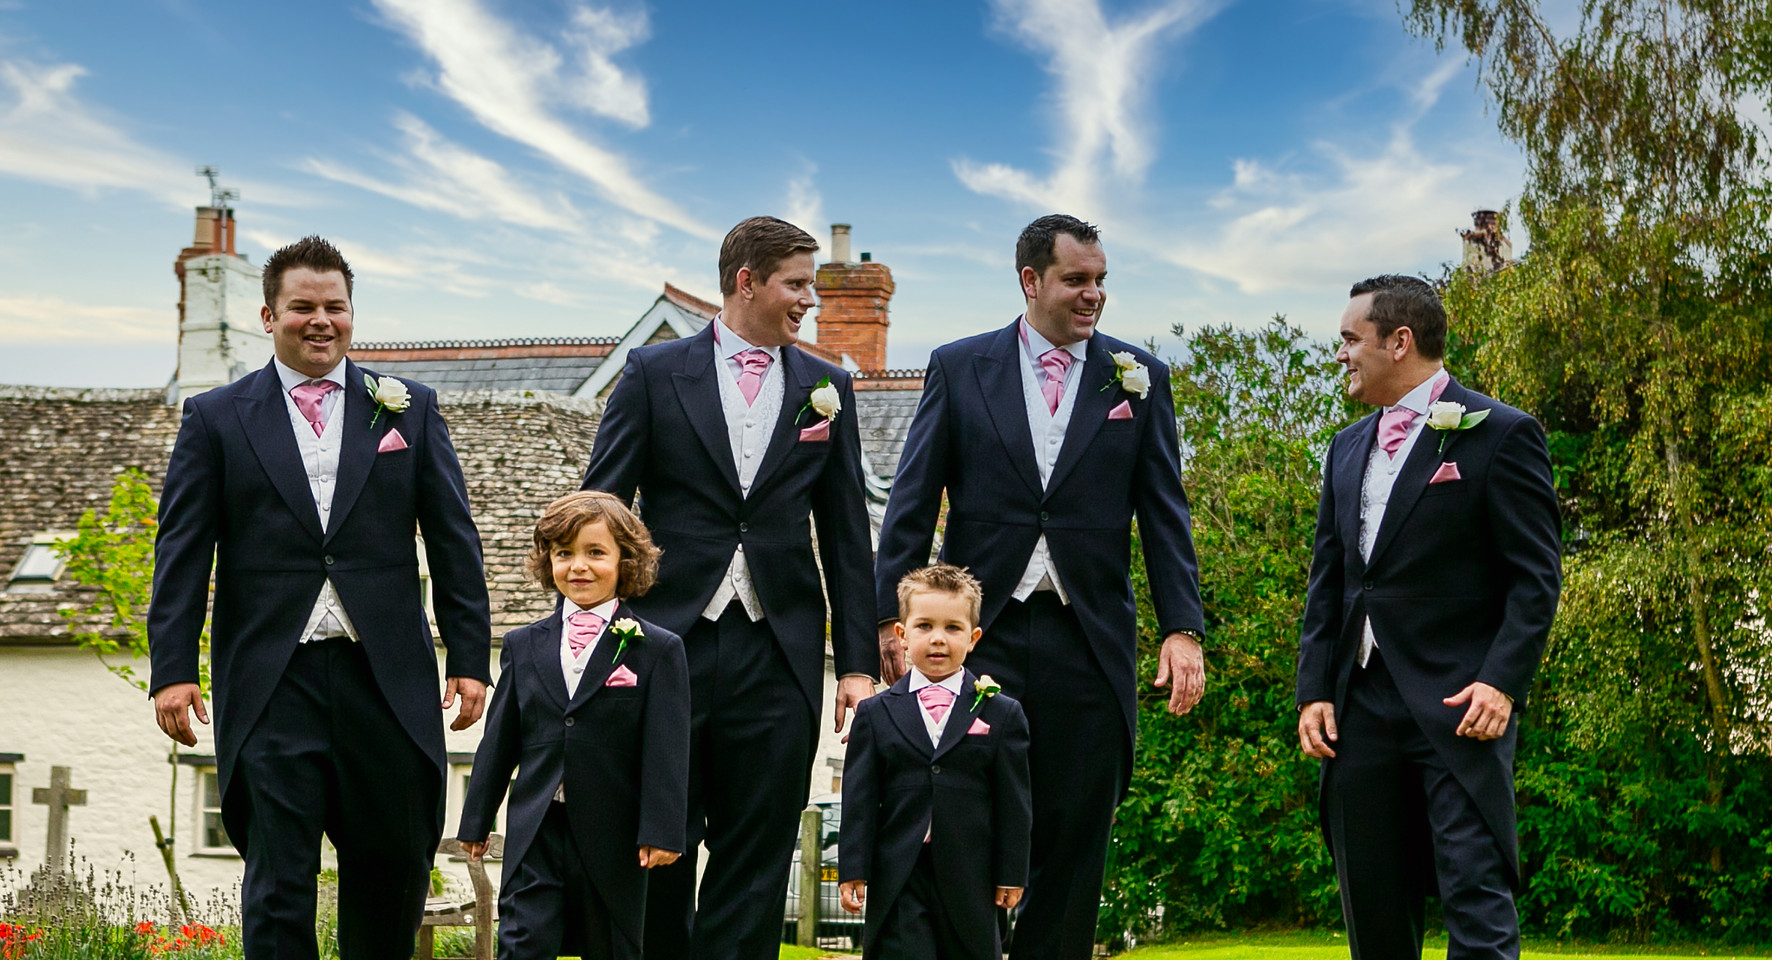 groomsmen and boys walk to church